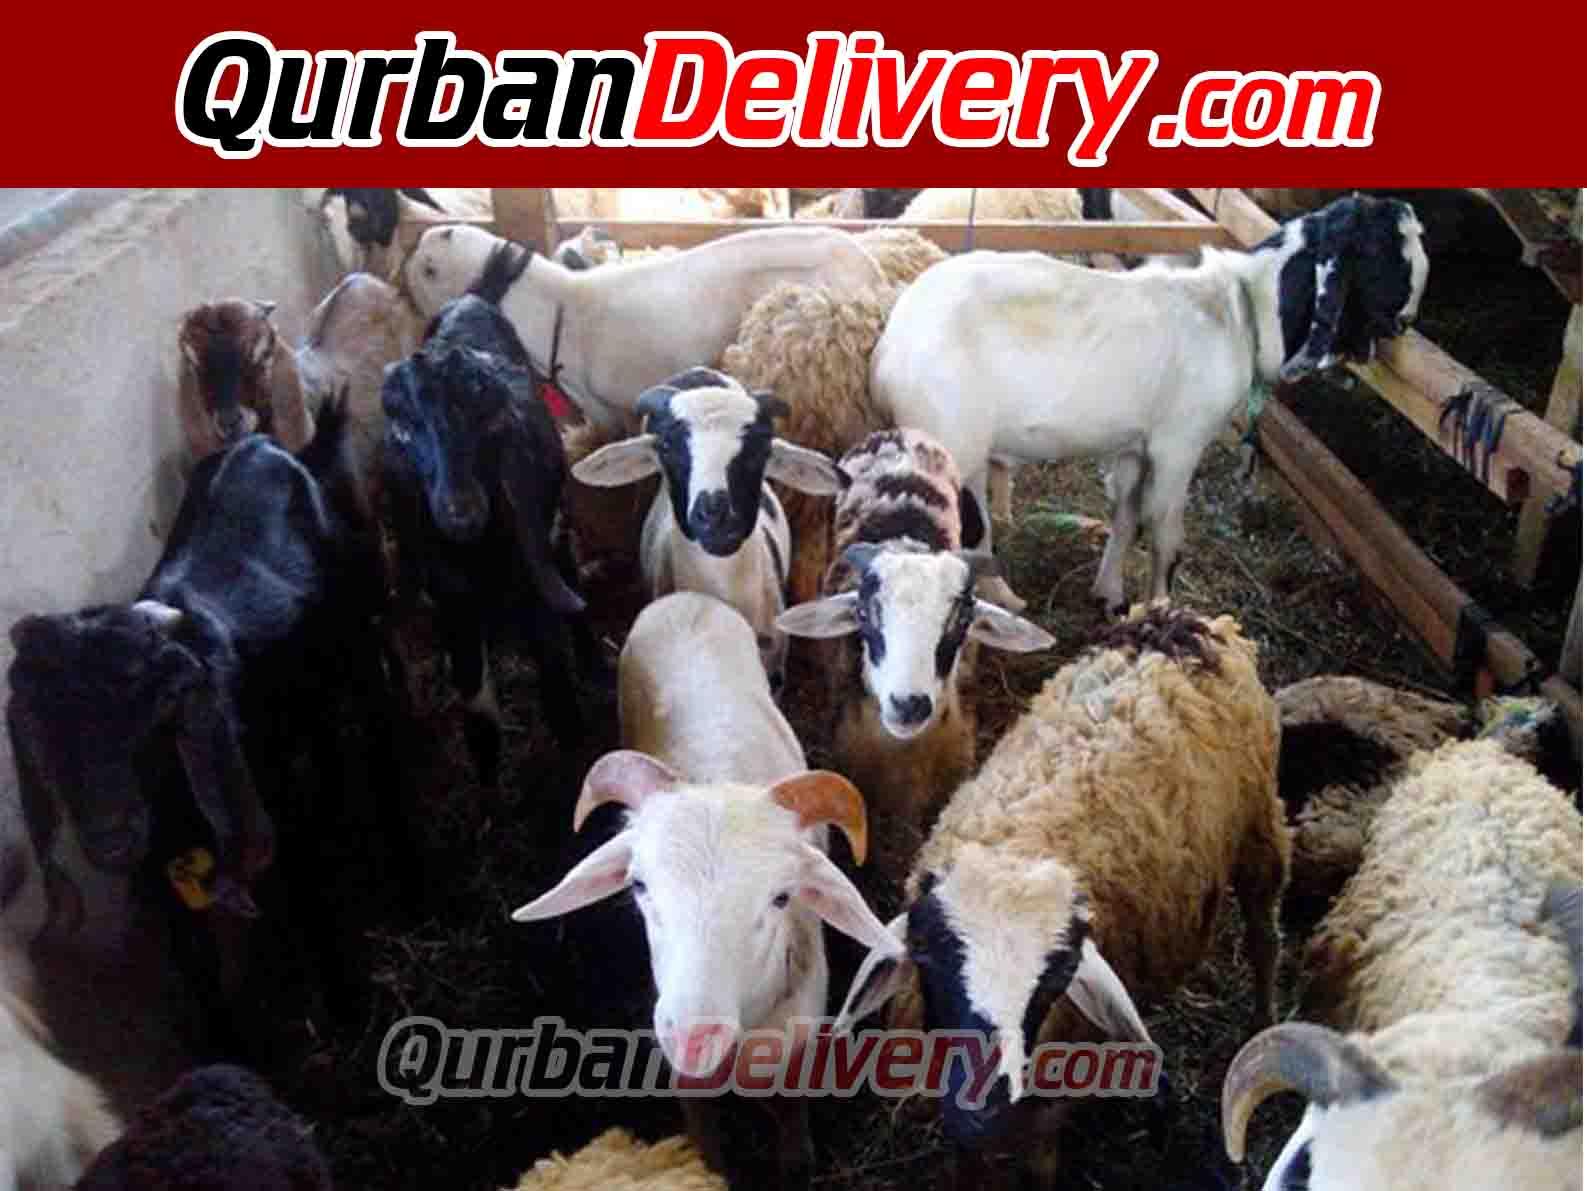 Jual Sapi Limosin Qurban Jabodetabek Prediksi 2020-Qurban Delivery